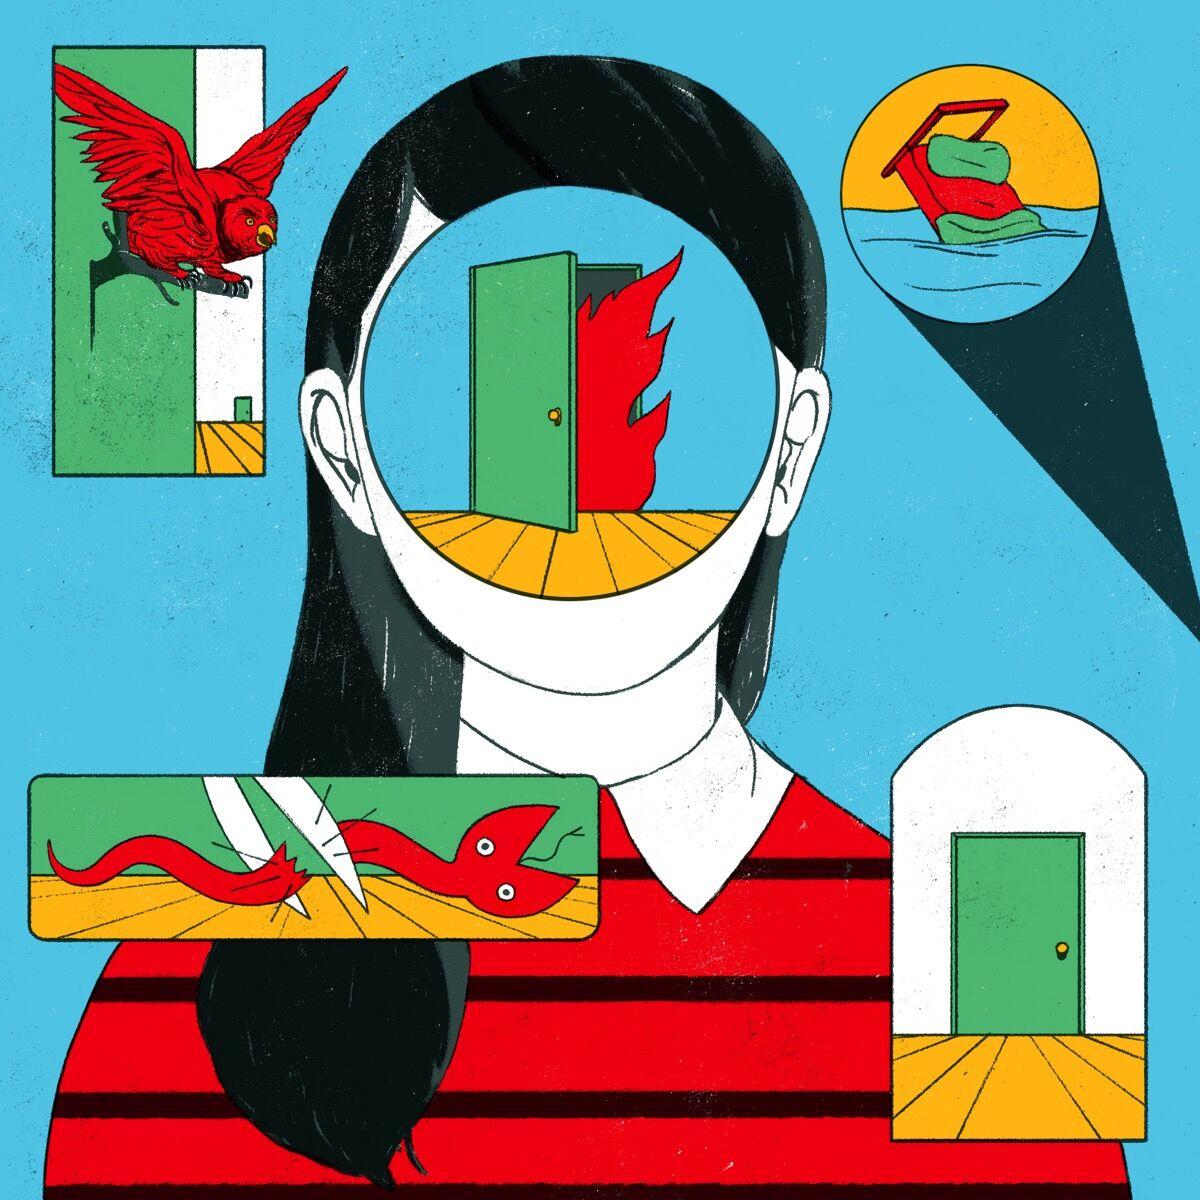 Cristina Daura, Illustration for the project #BorraelSida with PlayGround magazine and La Fundació Lluita contra el Sida. Courtesy of the artist.